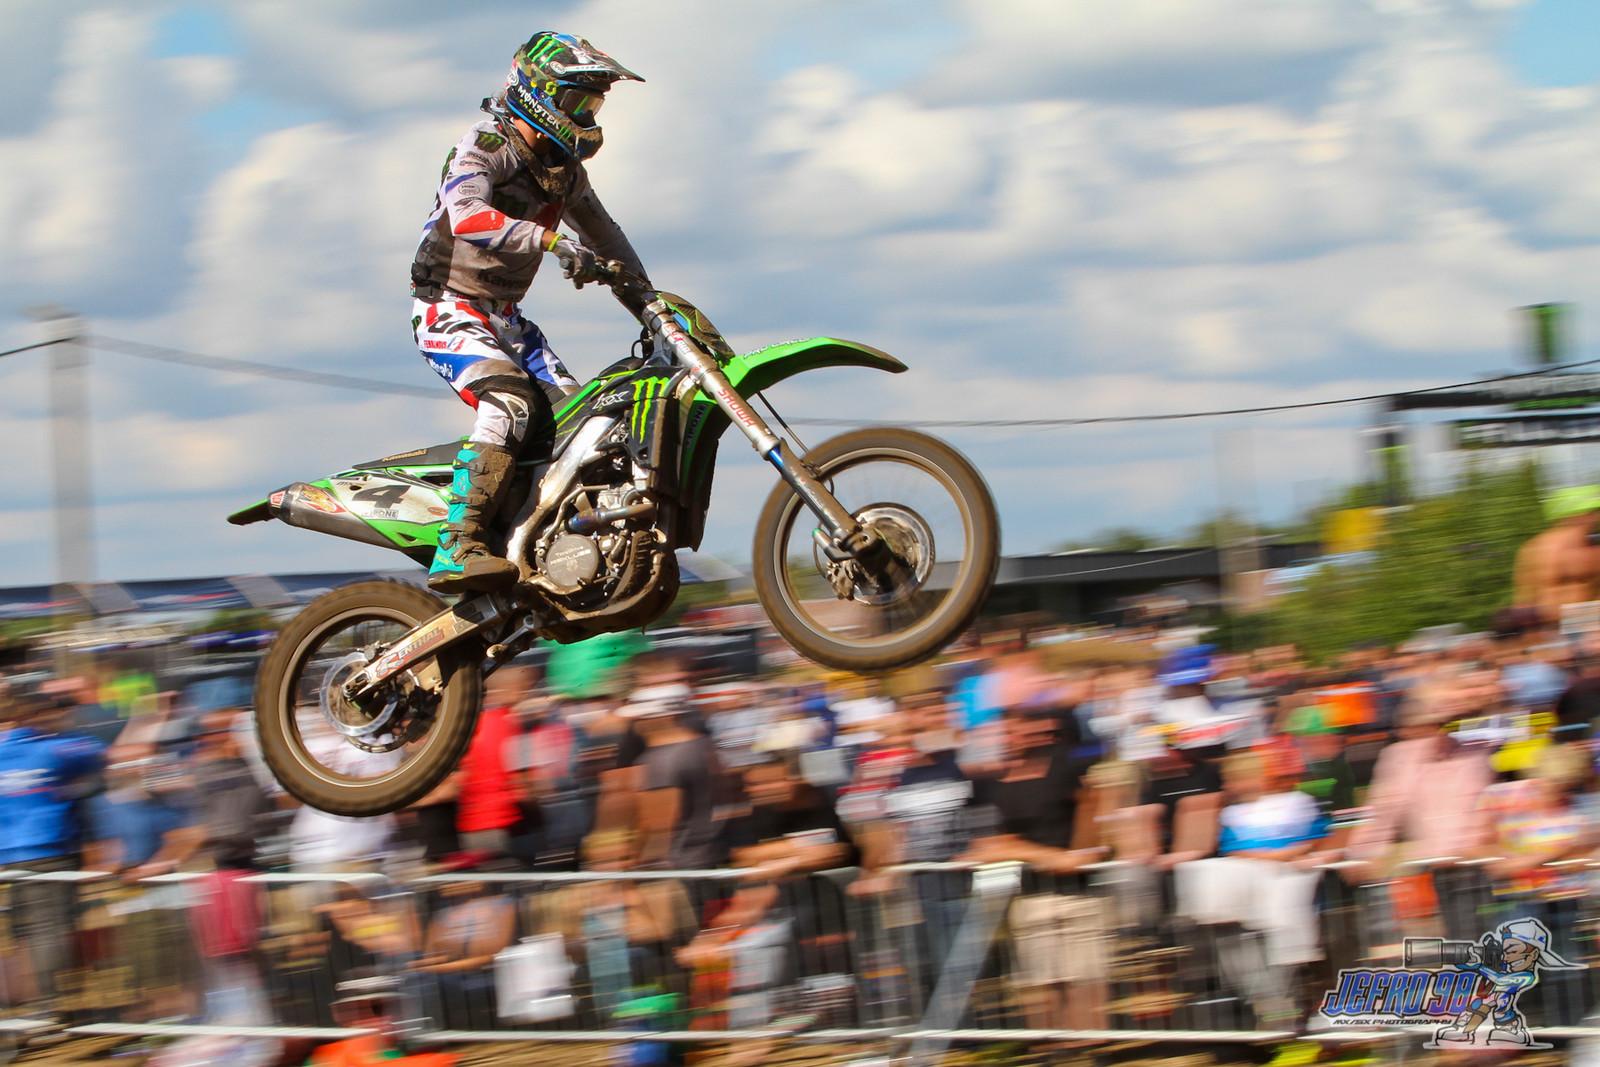 Dylan Ferrandis - Photo Gallery: MXGP of Limburg - Motocross Pictures - Vital MX